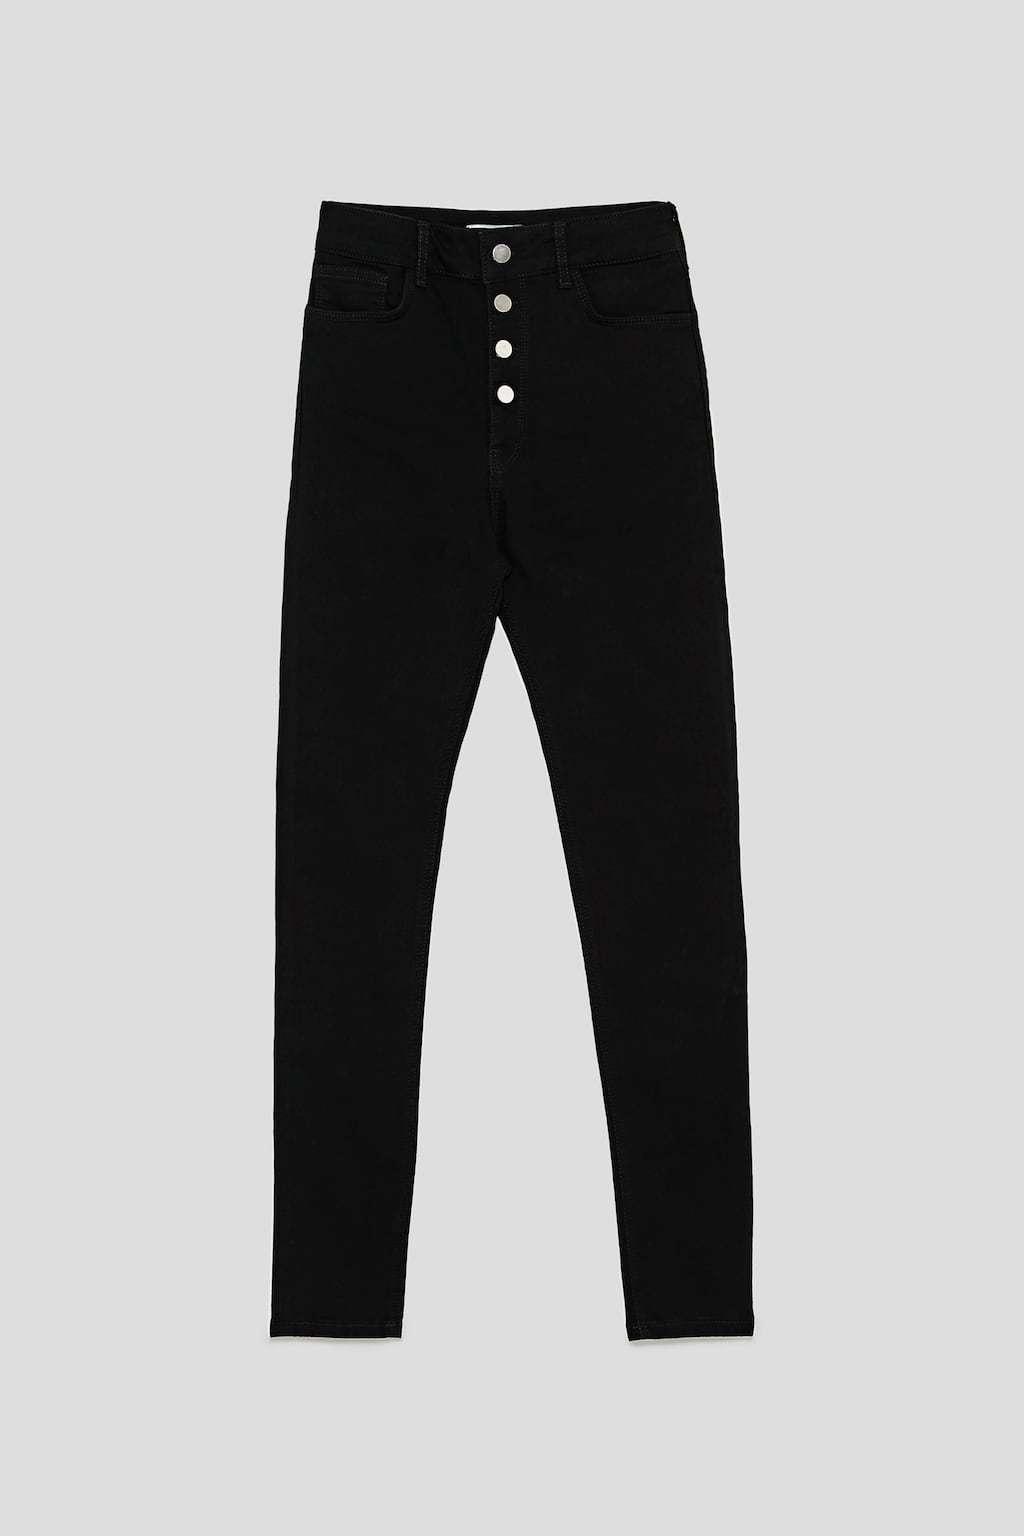 Vaquero negro de cintura alta de Zara